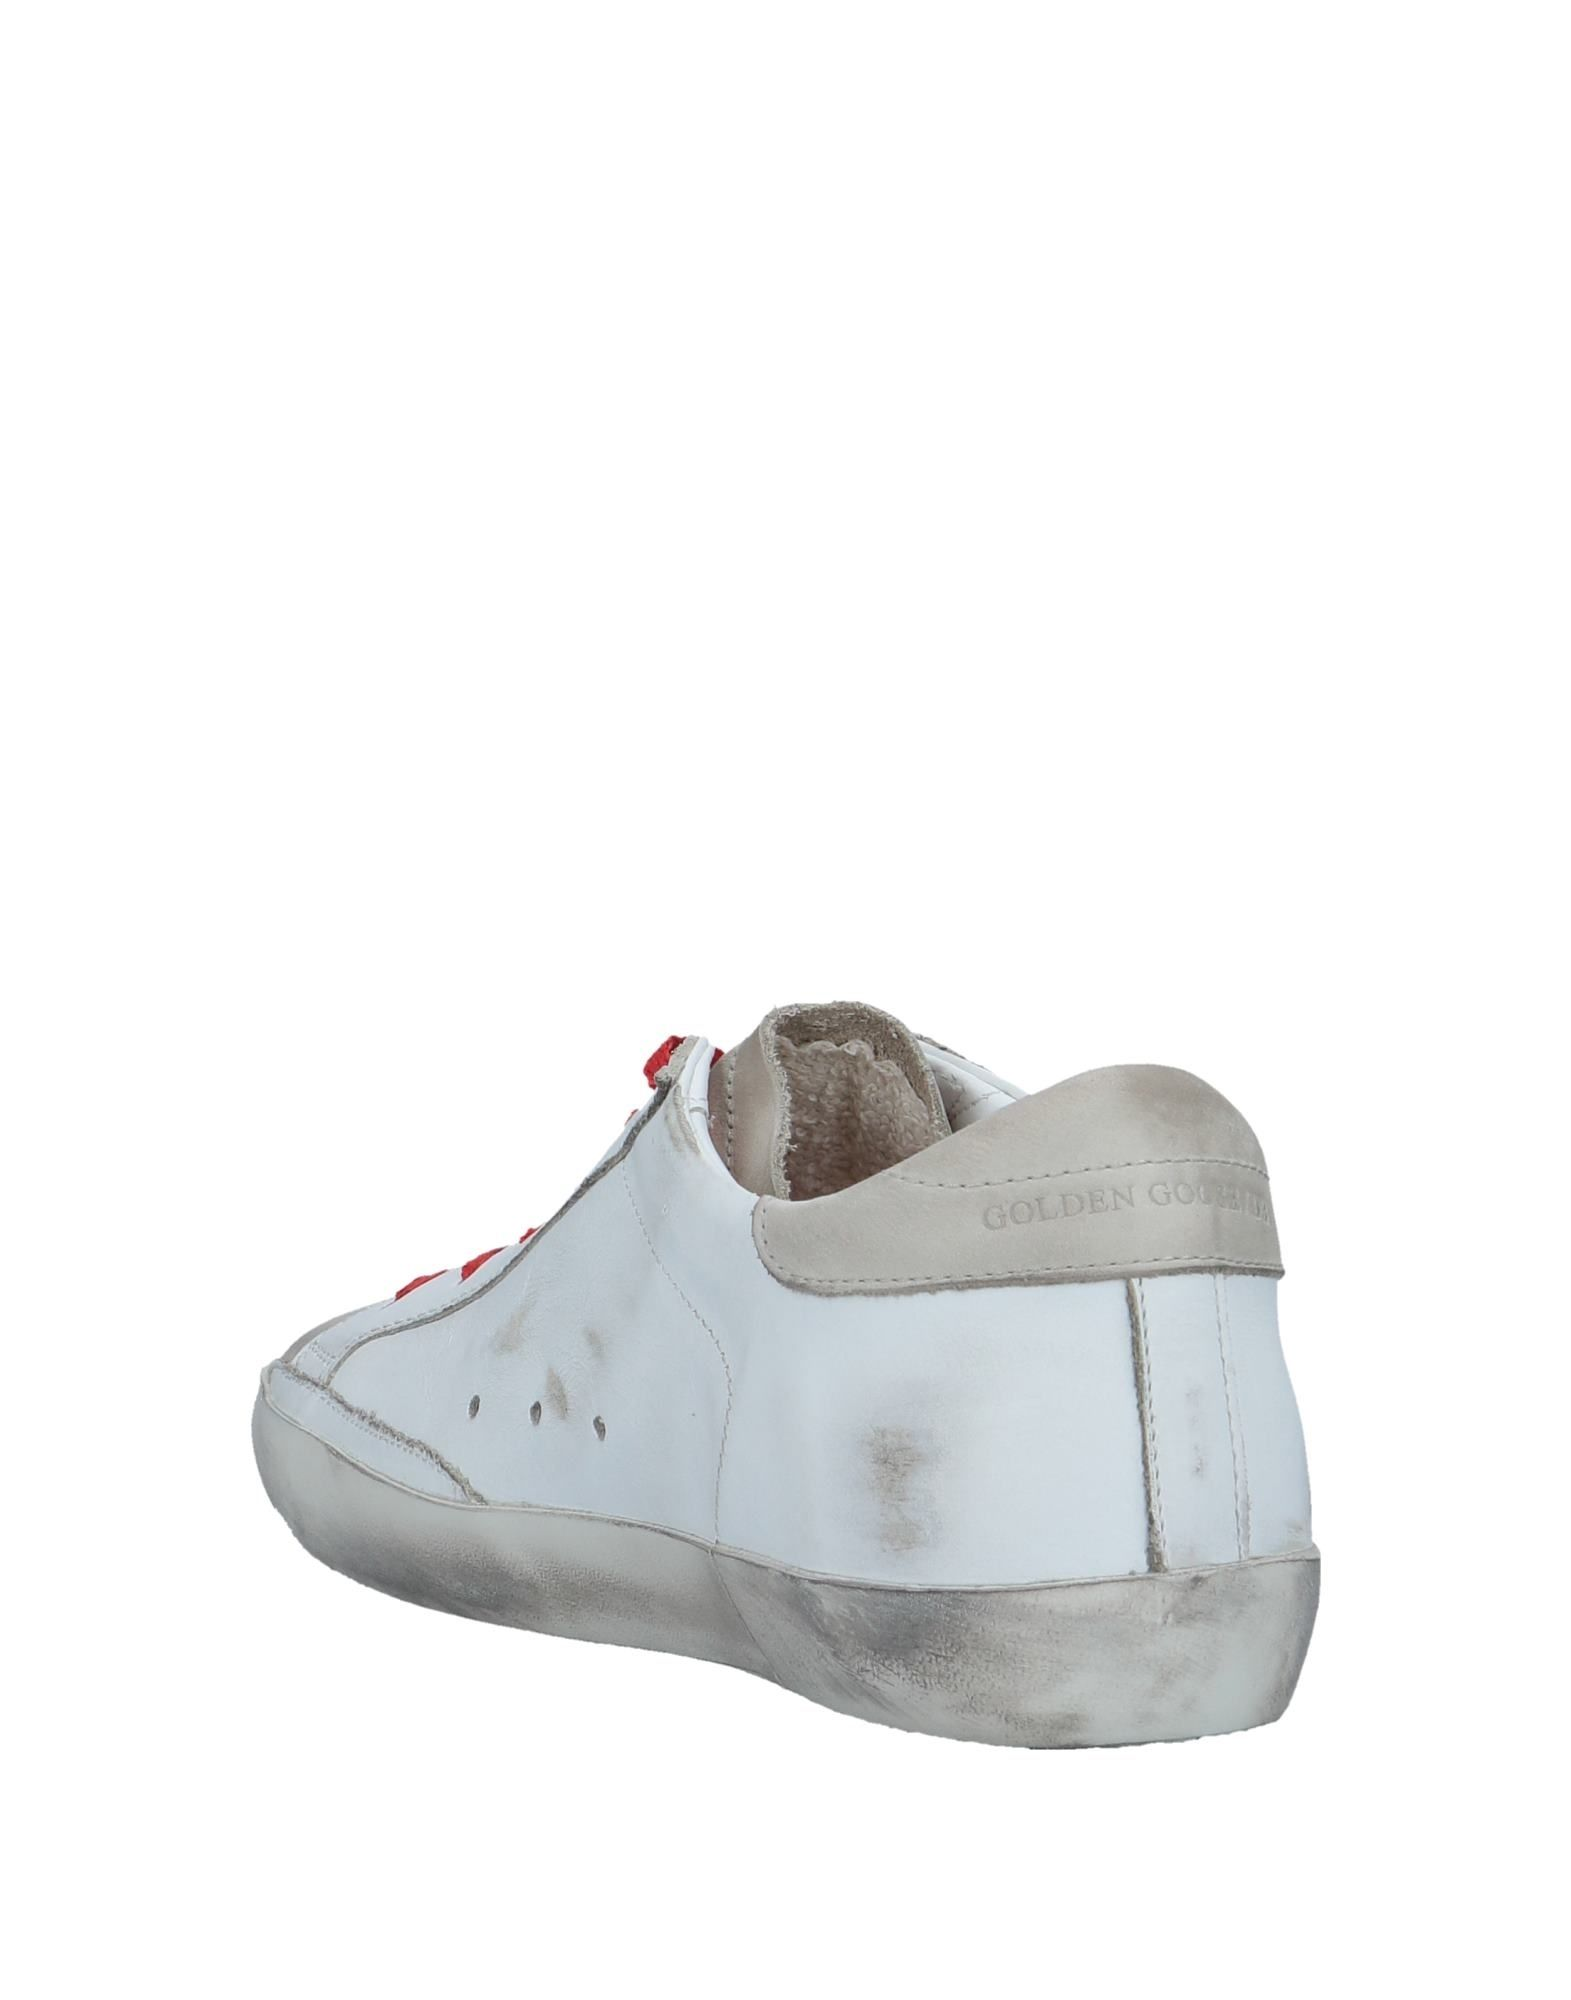 Golden Goose Deluxe Brand Sneakers strapazierfähige Damen  11507035HOGut aussehende strapazierfähige Sneakers Schuhe a7d393